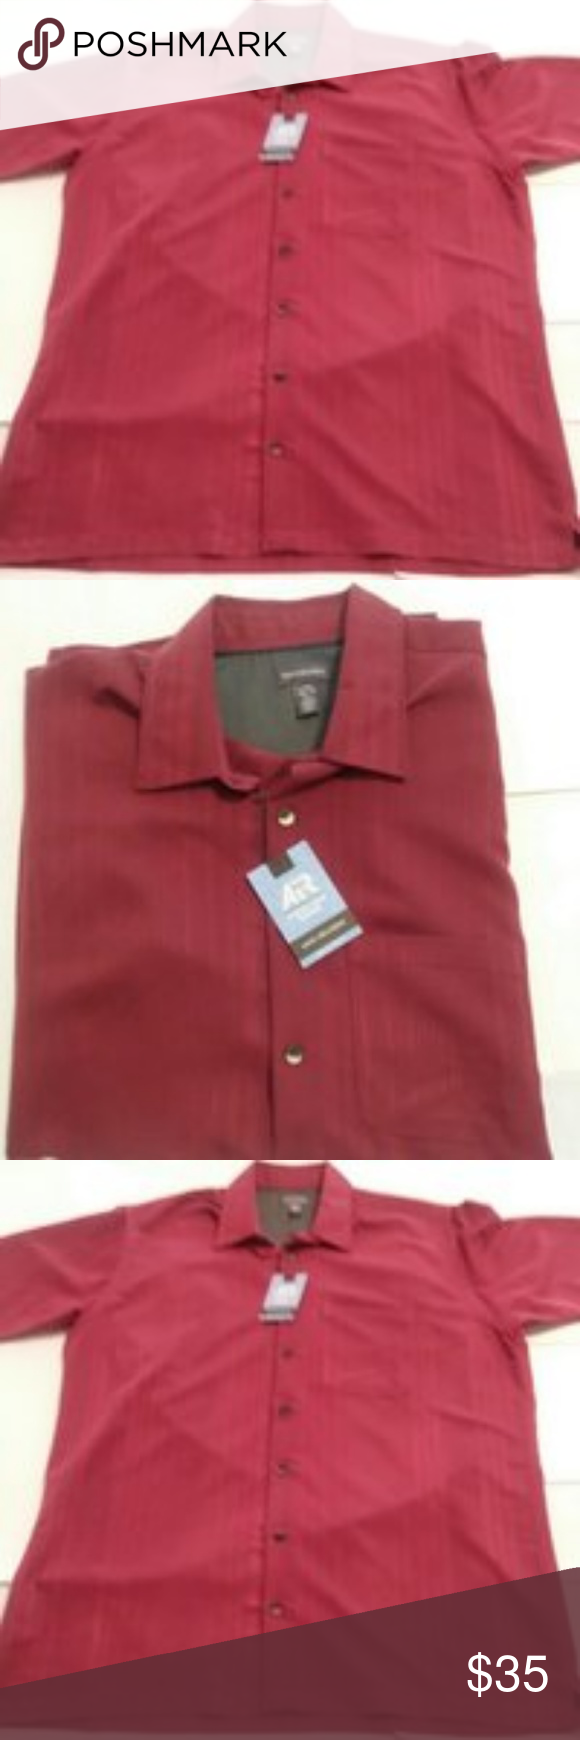 Men S Van Heusen Casual Shirt Inexpensive Designer Men S Van Heusen Clothing Shirts Van Heusen Big Tall Air Cooling Zone Tempera Casual Shirts For Men Casual